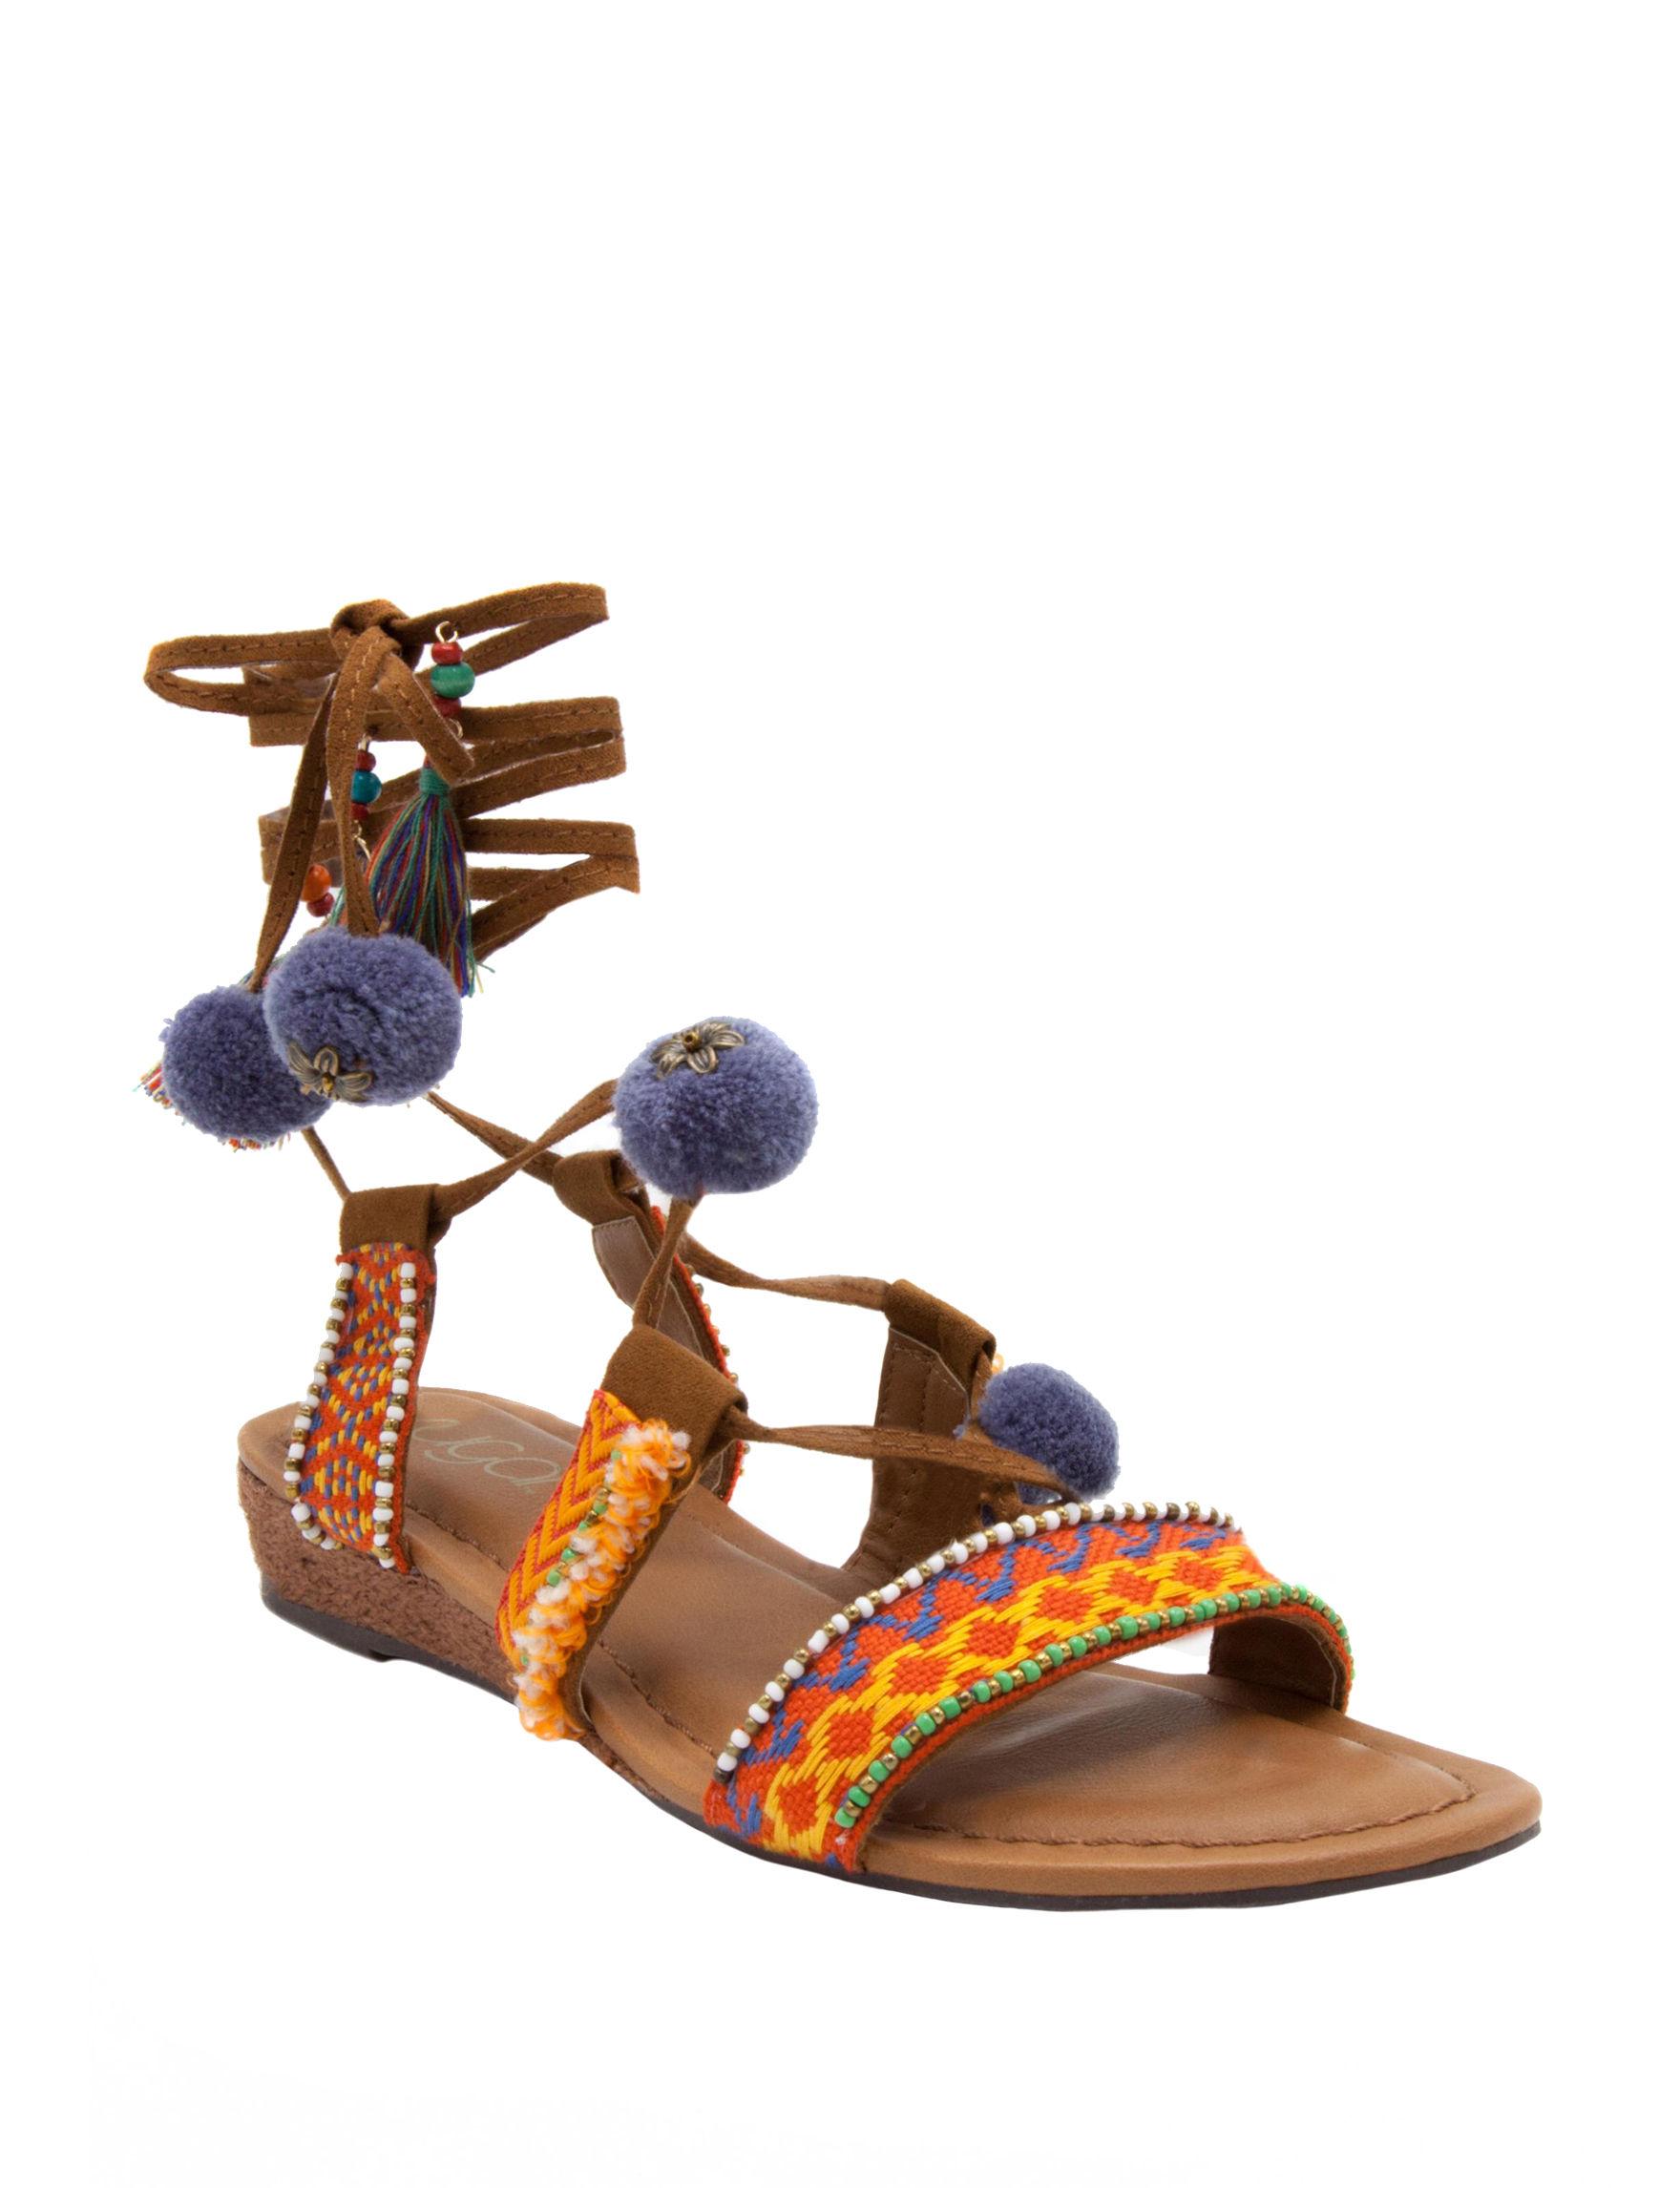 Sugar Cognac Espadrille Flat Sandals